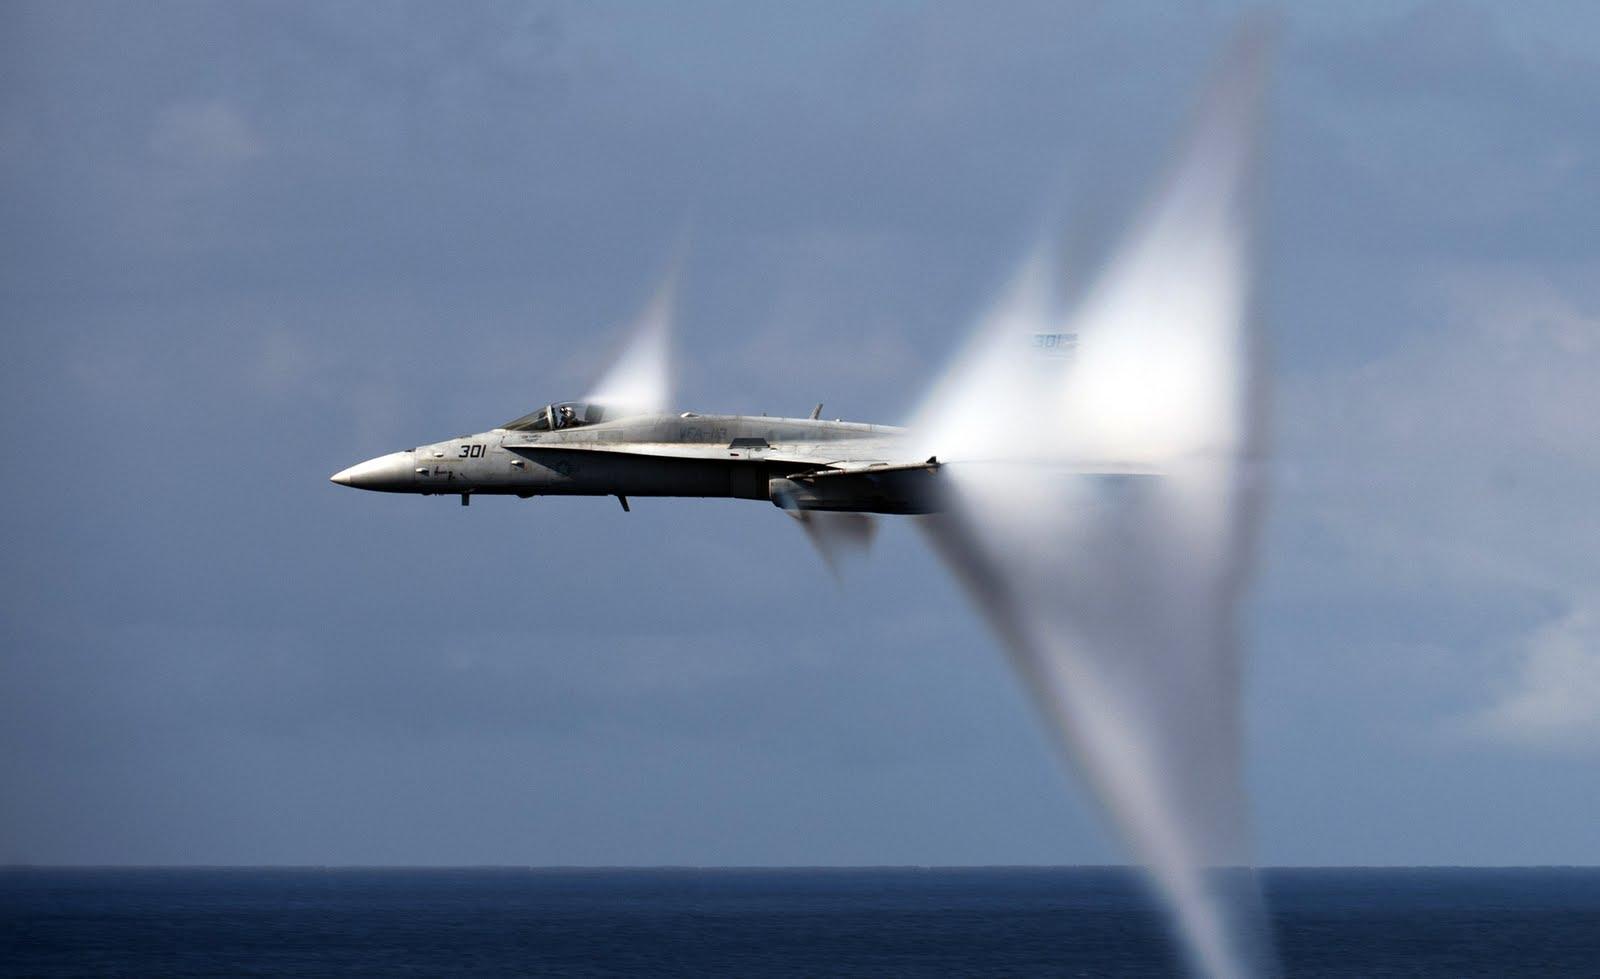 paul davis on crime cool photo a u s navy aircraft breaks the